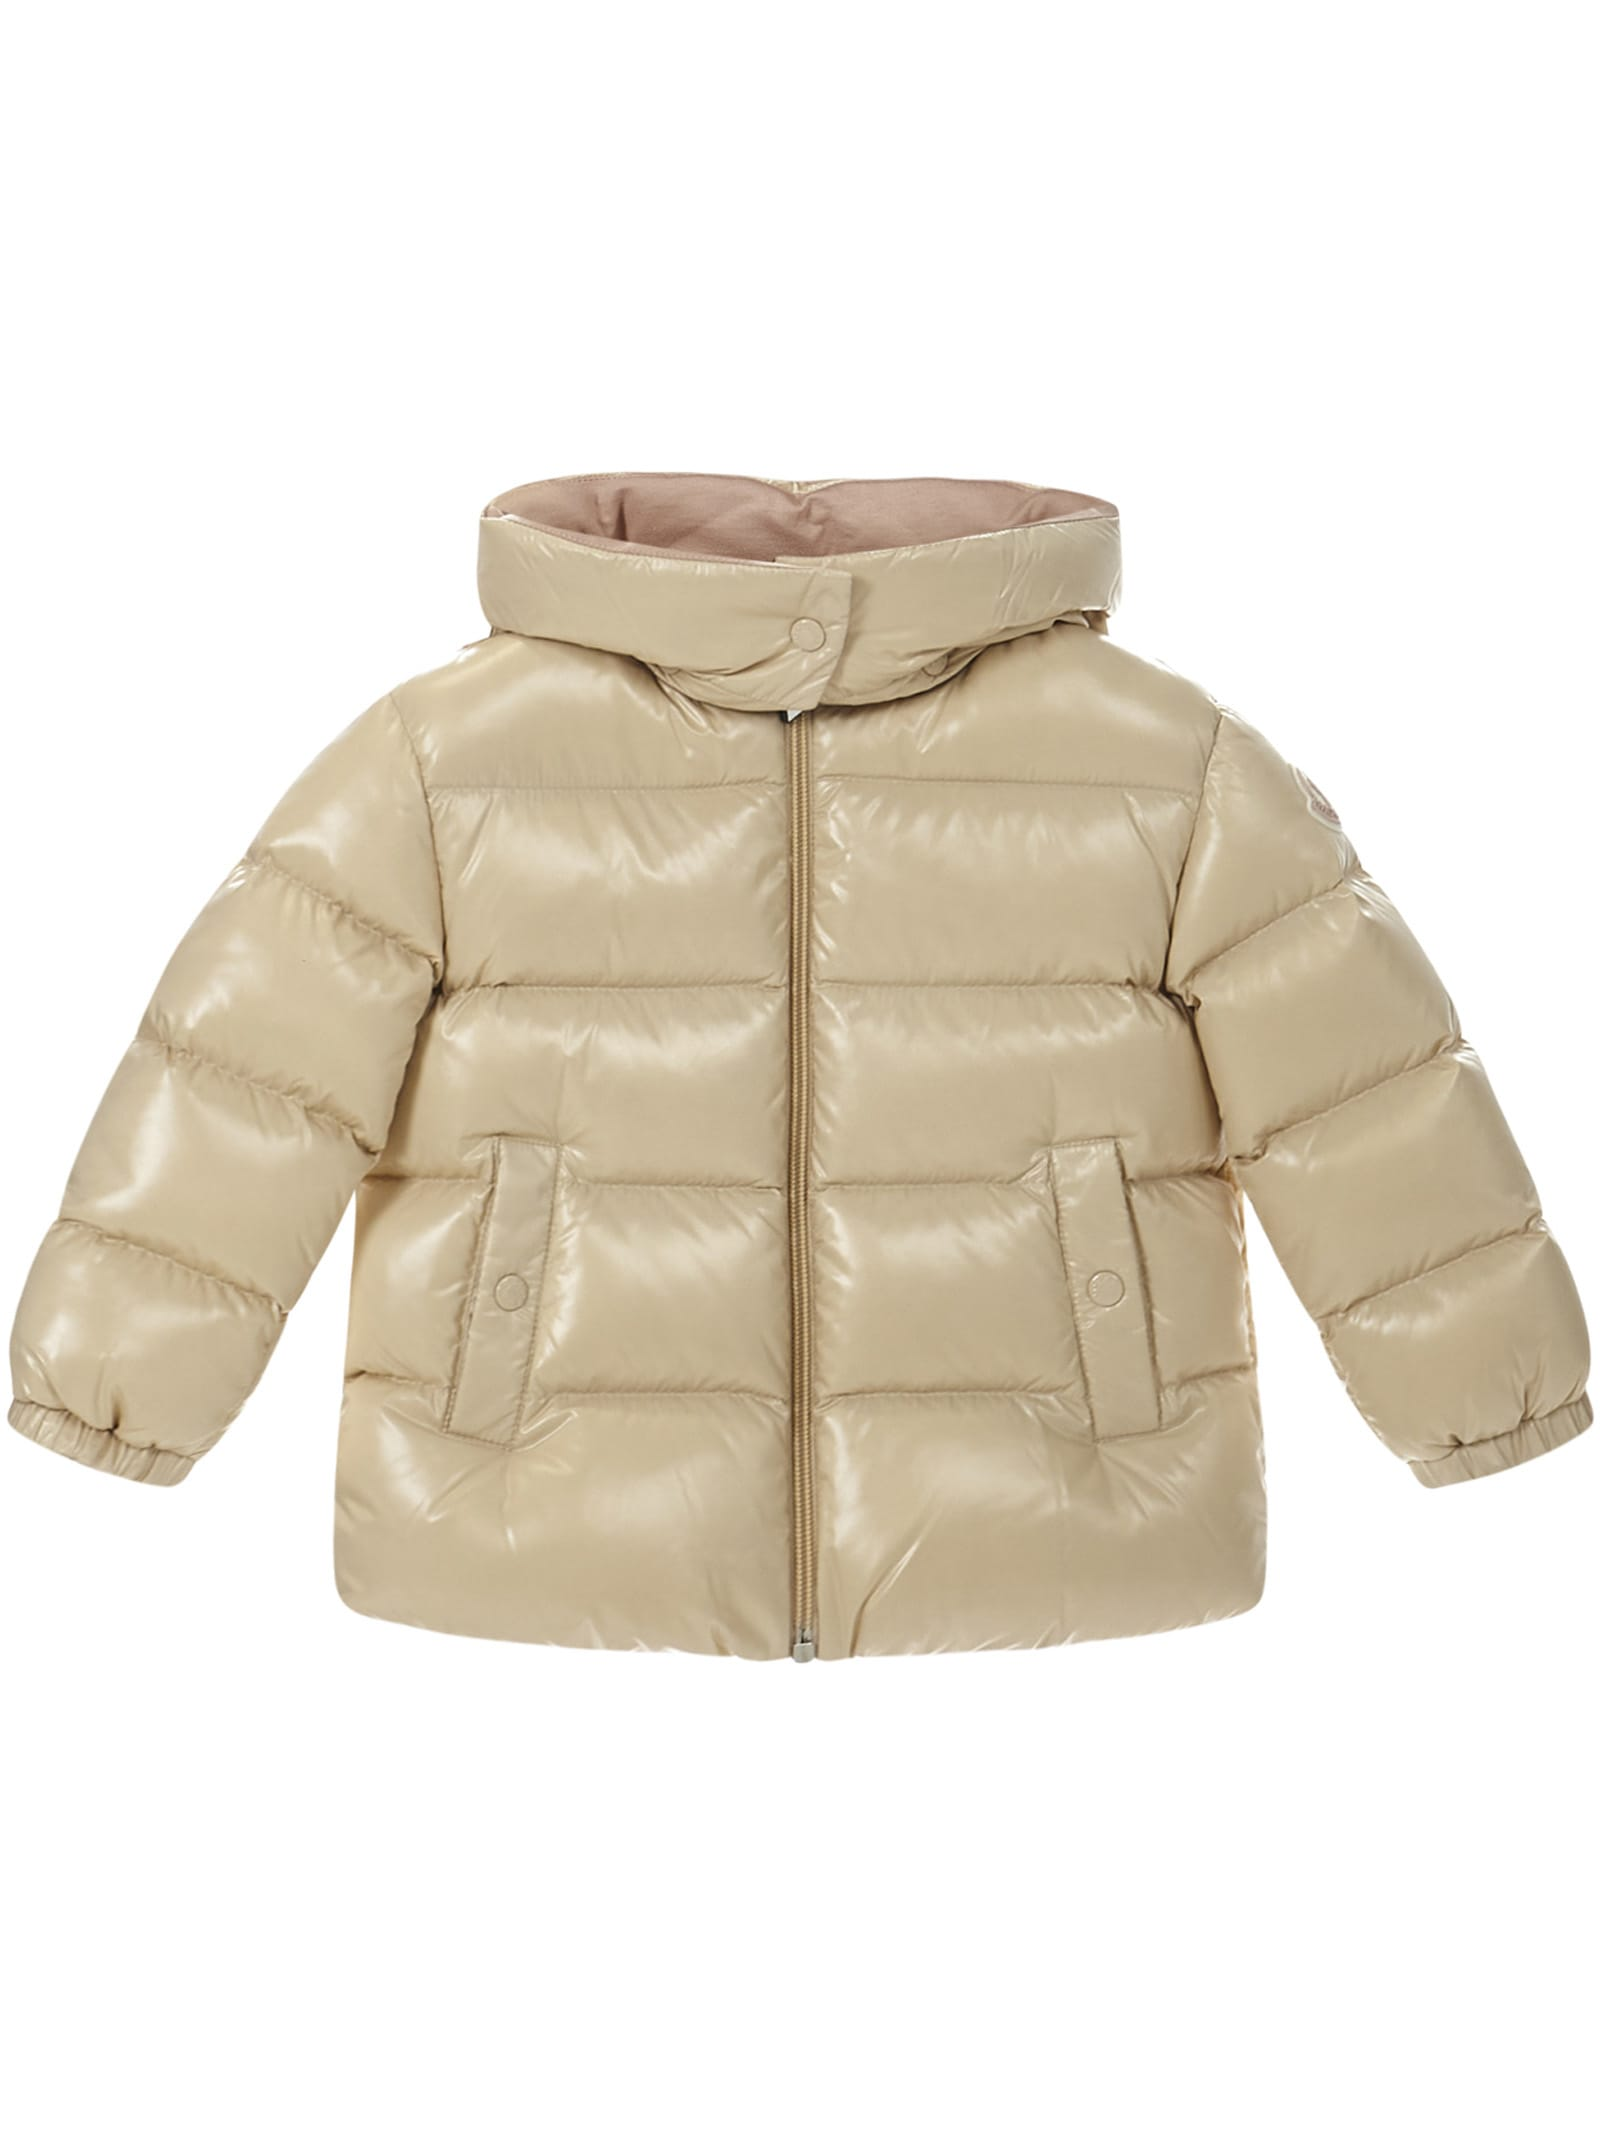 Moncler Enfant Selen Down Jacket